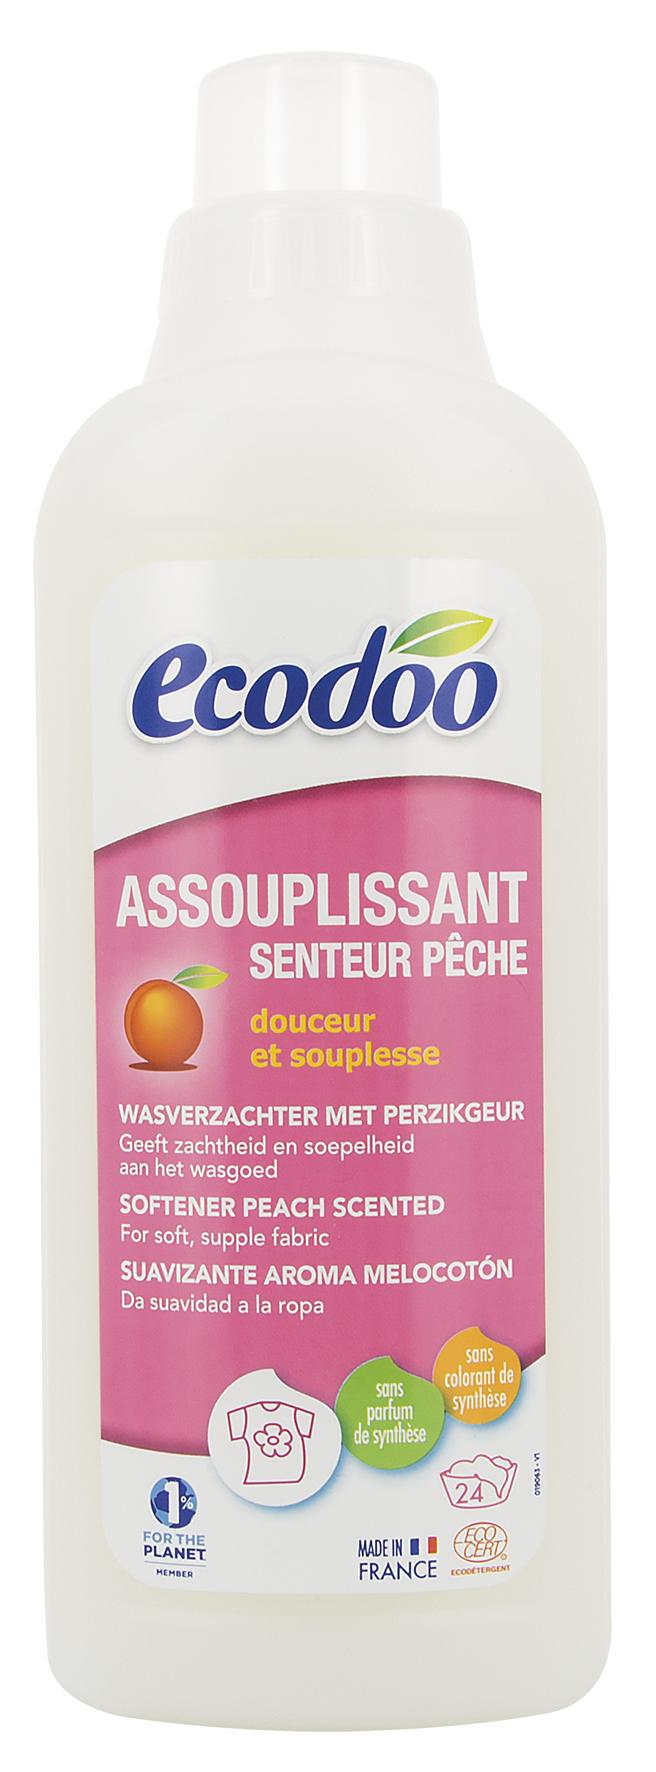 Assouplissant senteur pêche, Ecodoo (750 ml)